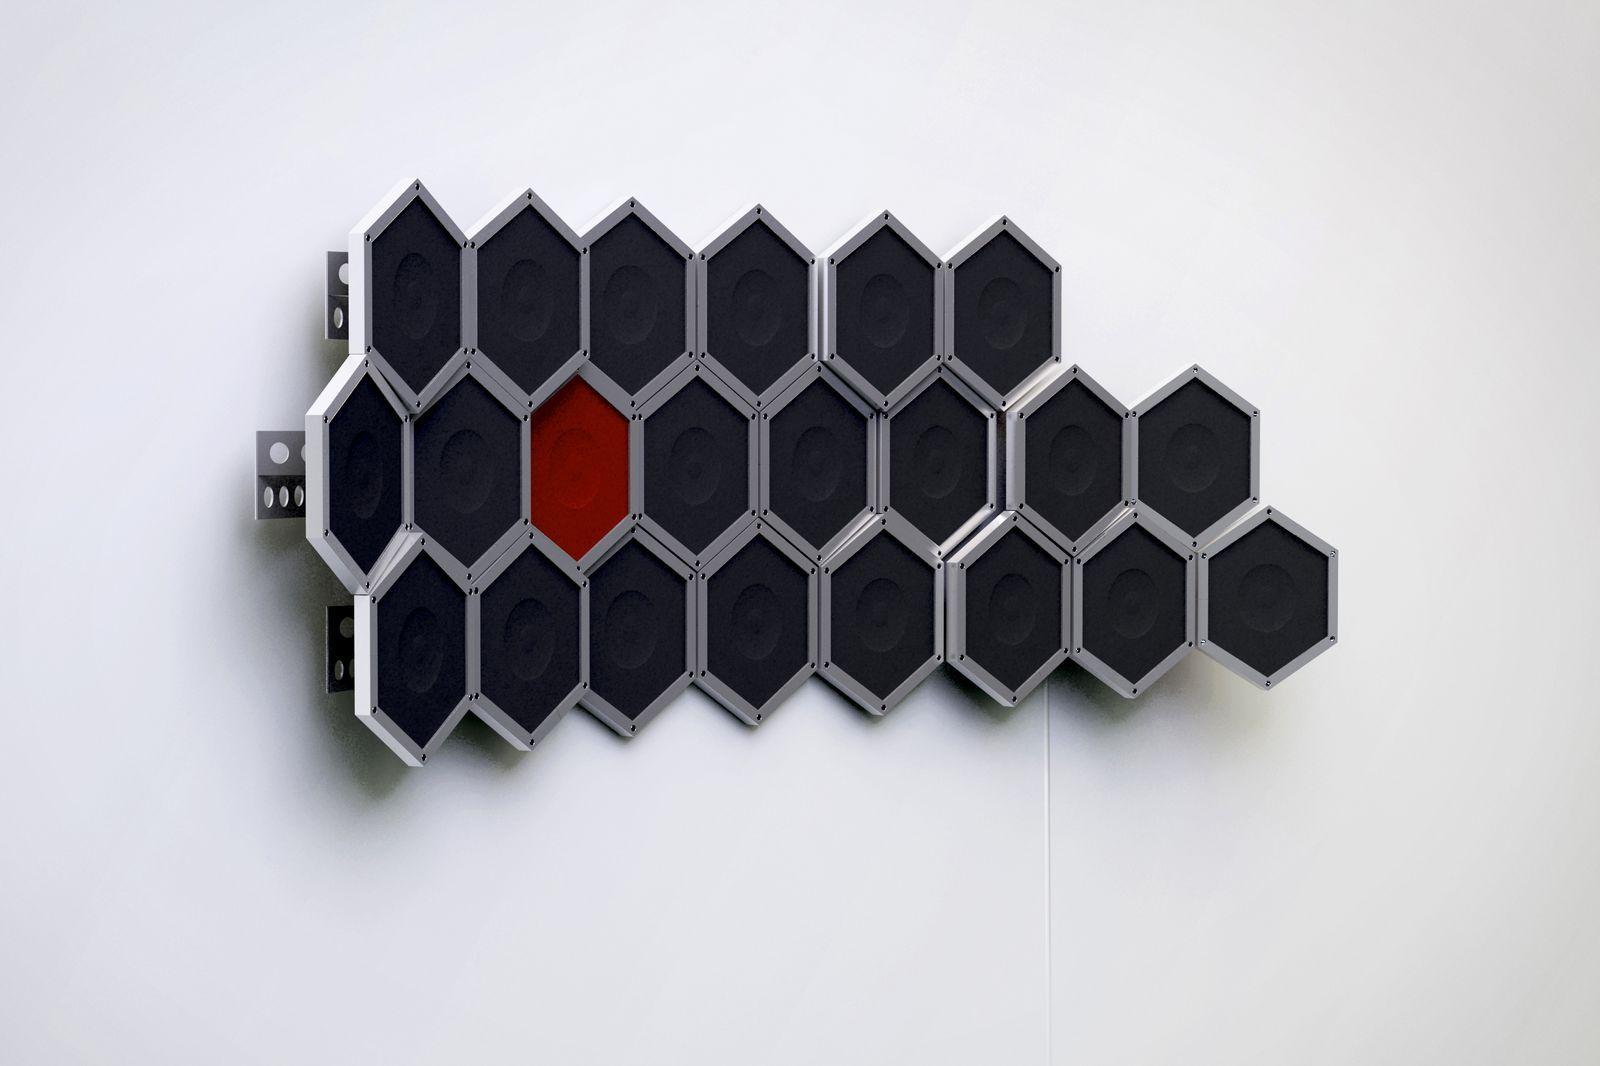 Hive modular speakers system 2009 The Hive modular speakers